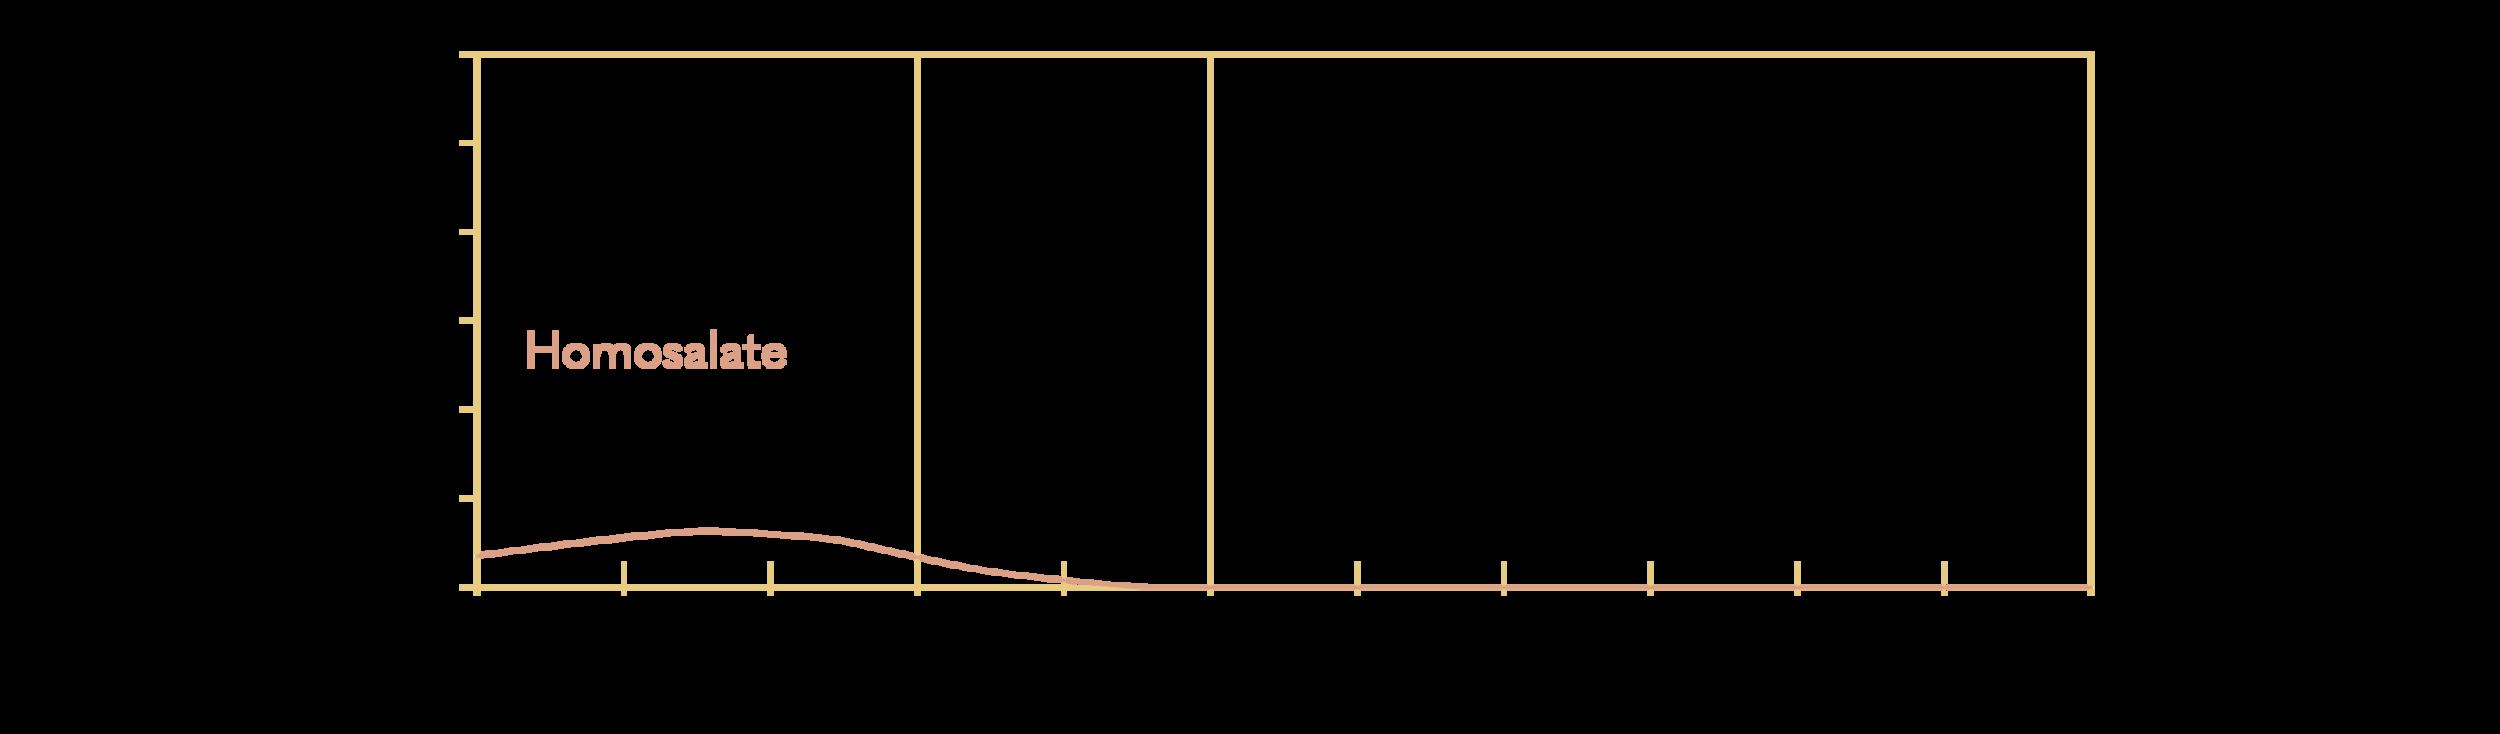 Homosalate (or Homomethyl Salicylate)